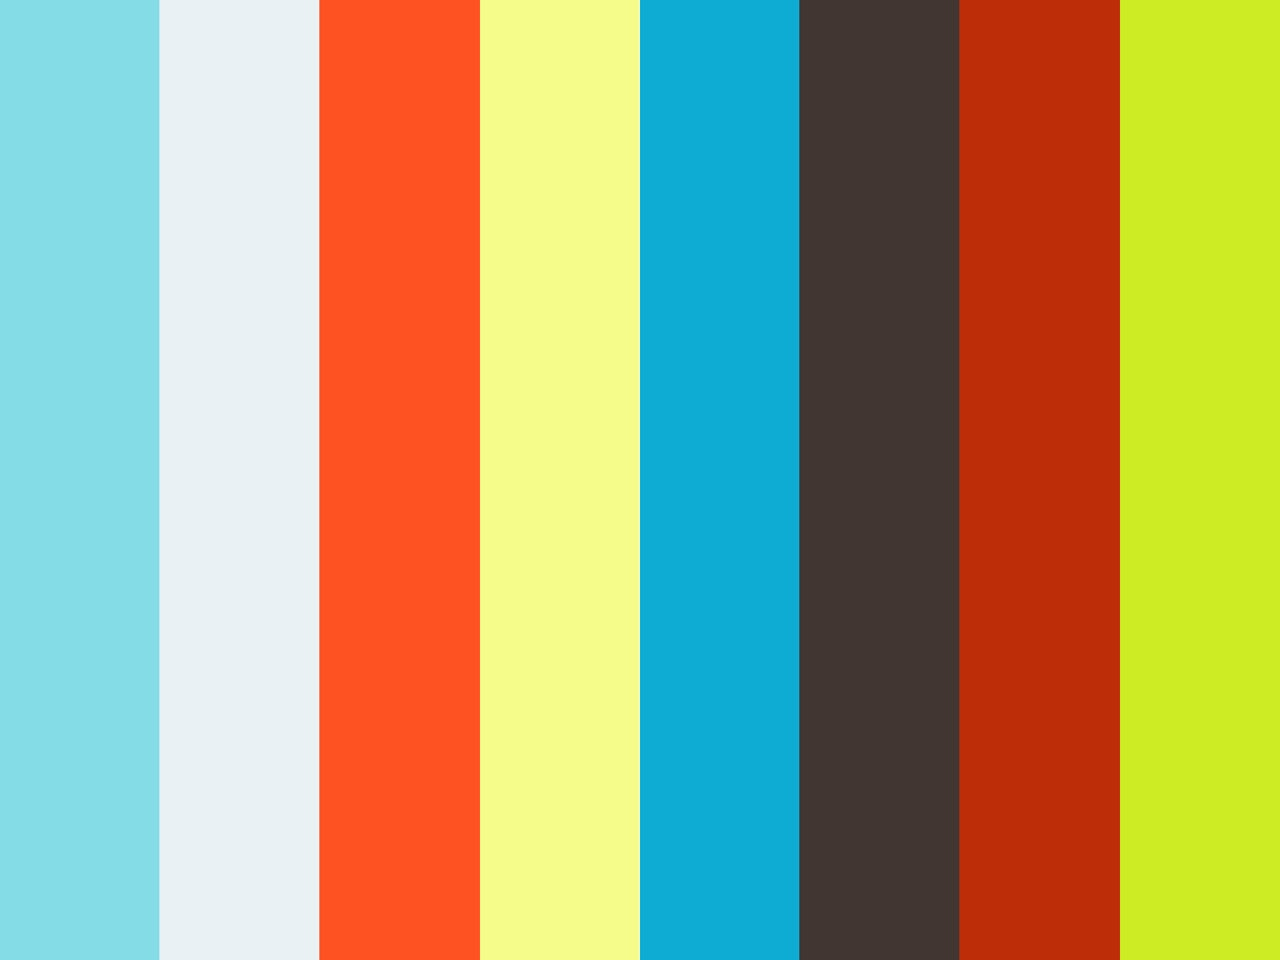 180318 CARONNESE-BORGOSESIA 2-0 - INT DIDU